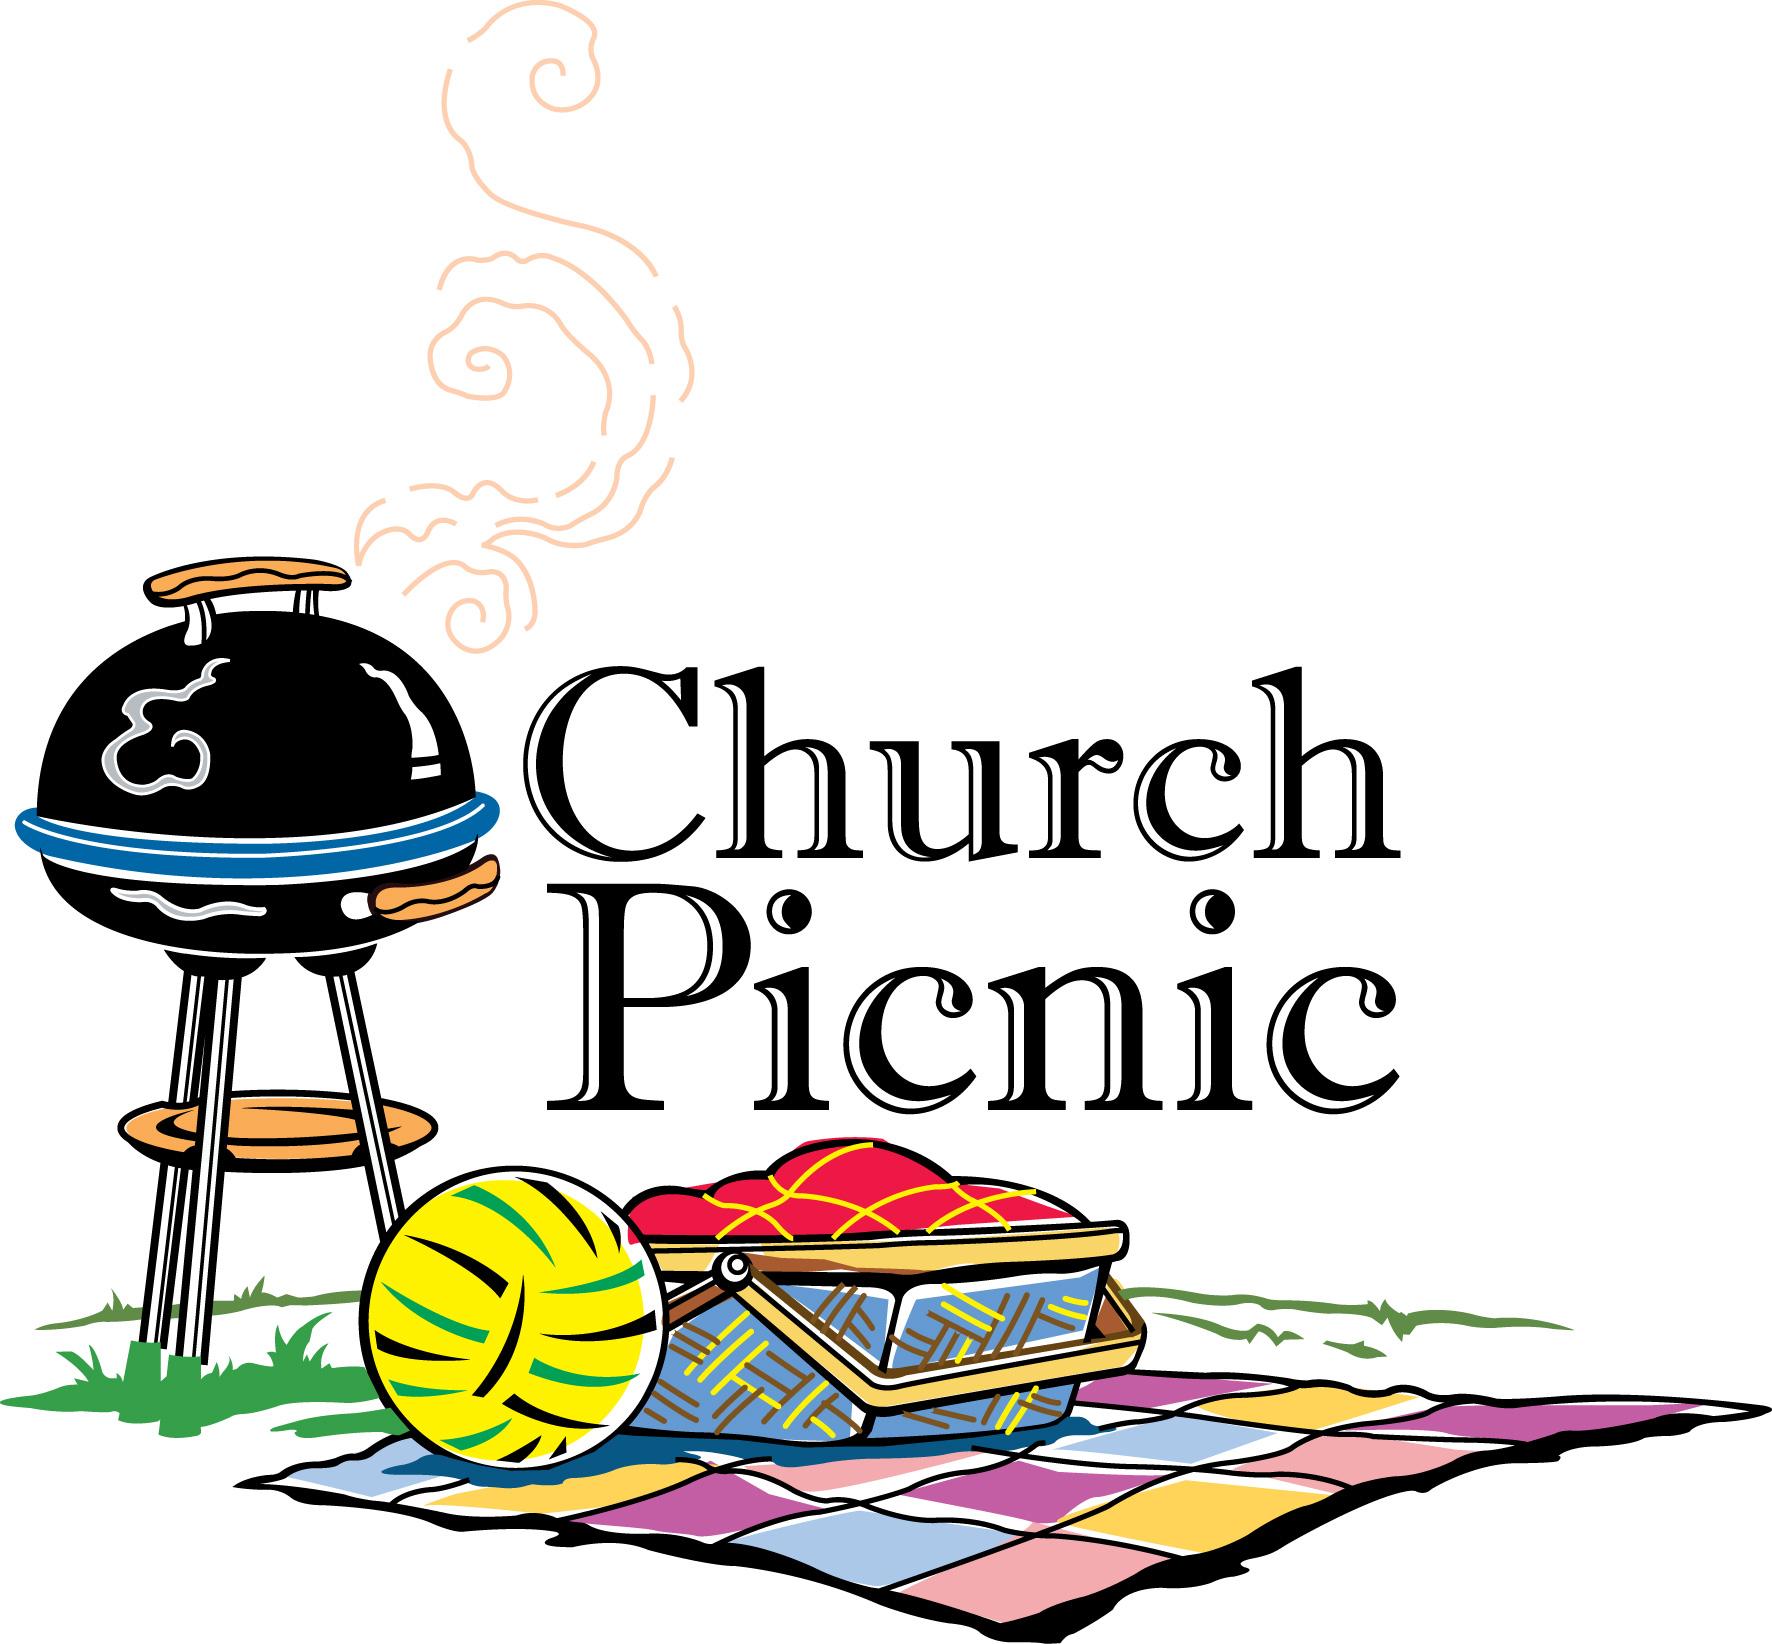 family picnic clipart - photo #10